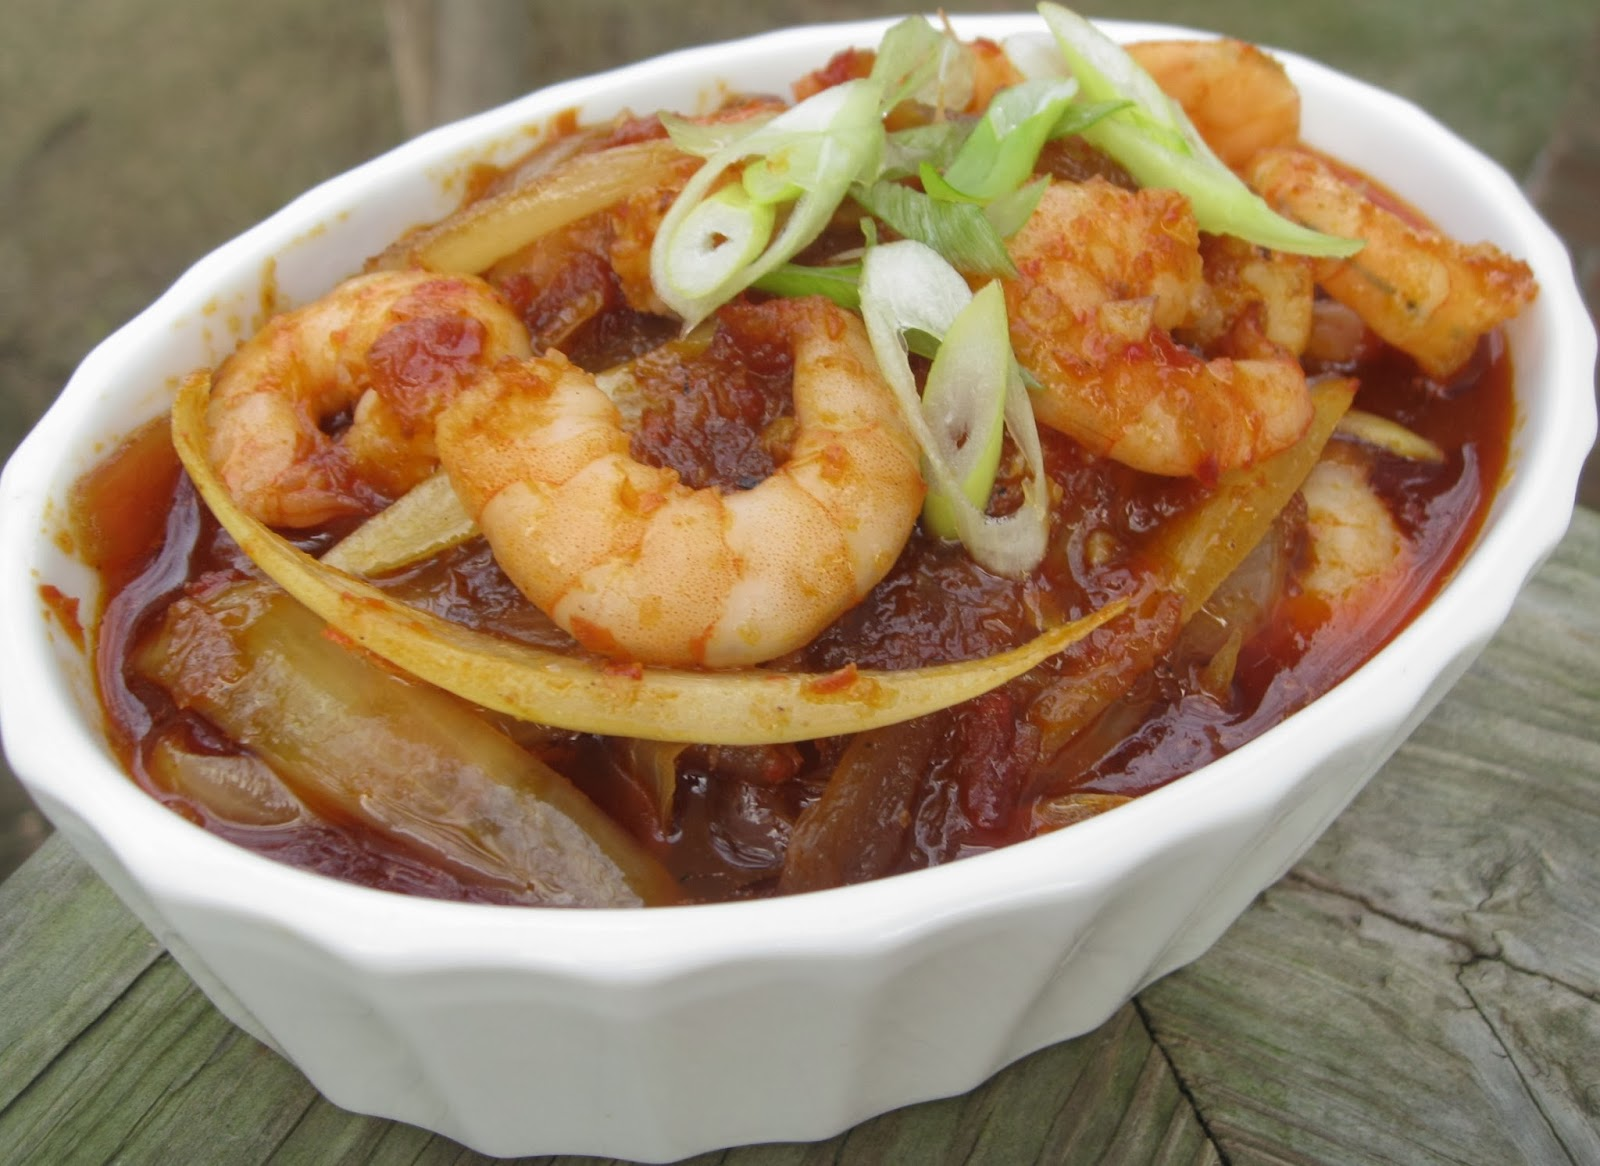 My Asian Kitchen: 12/1/13 - 1/1/14